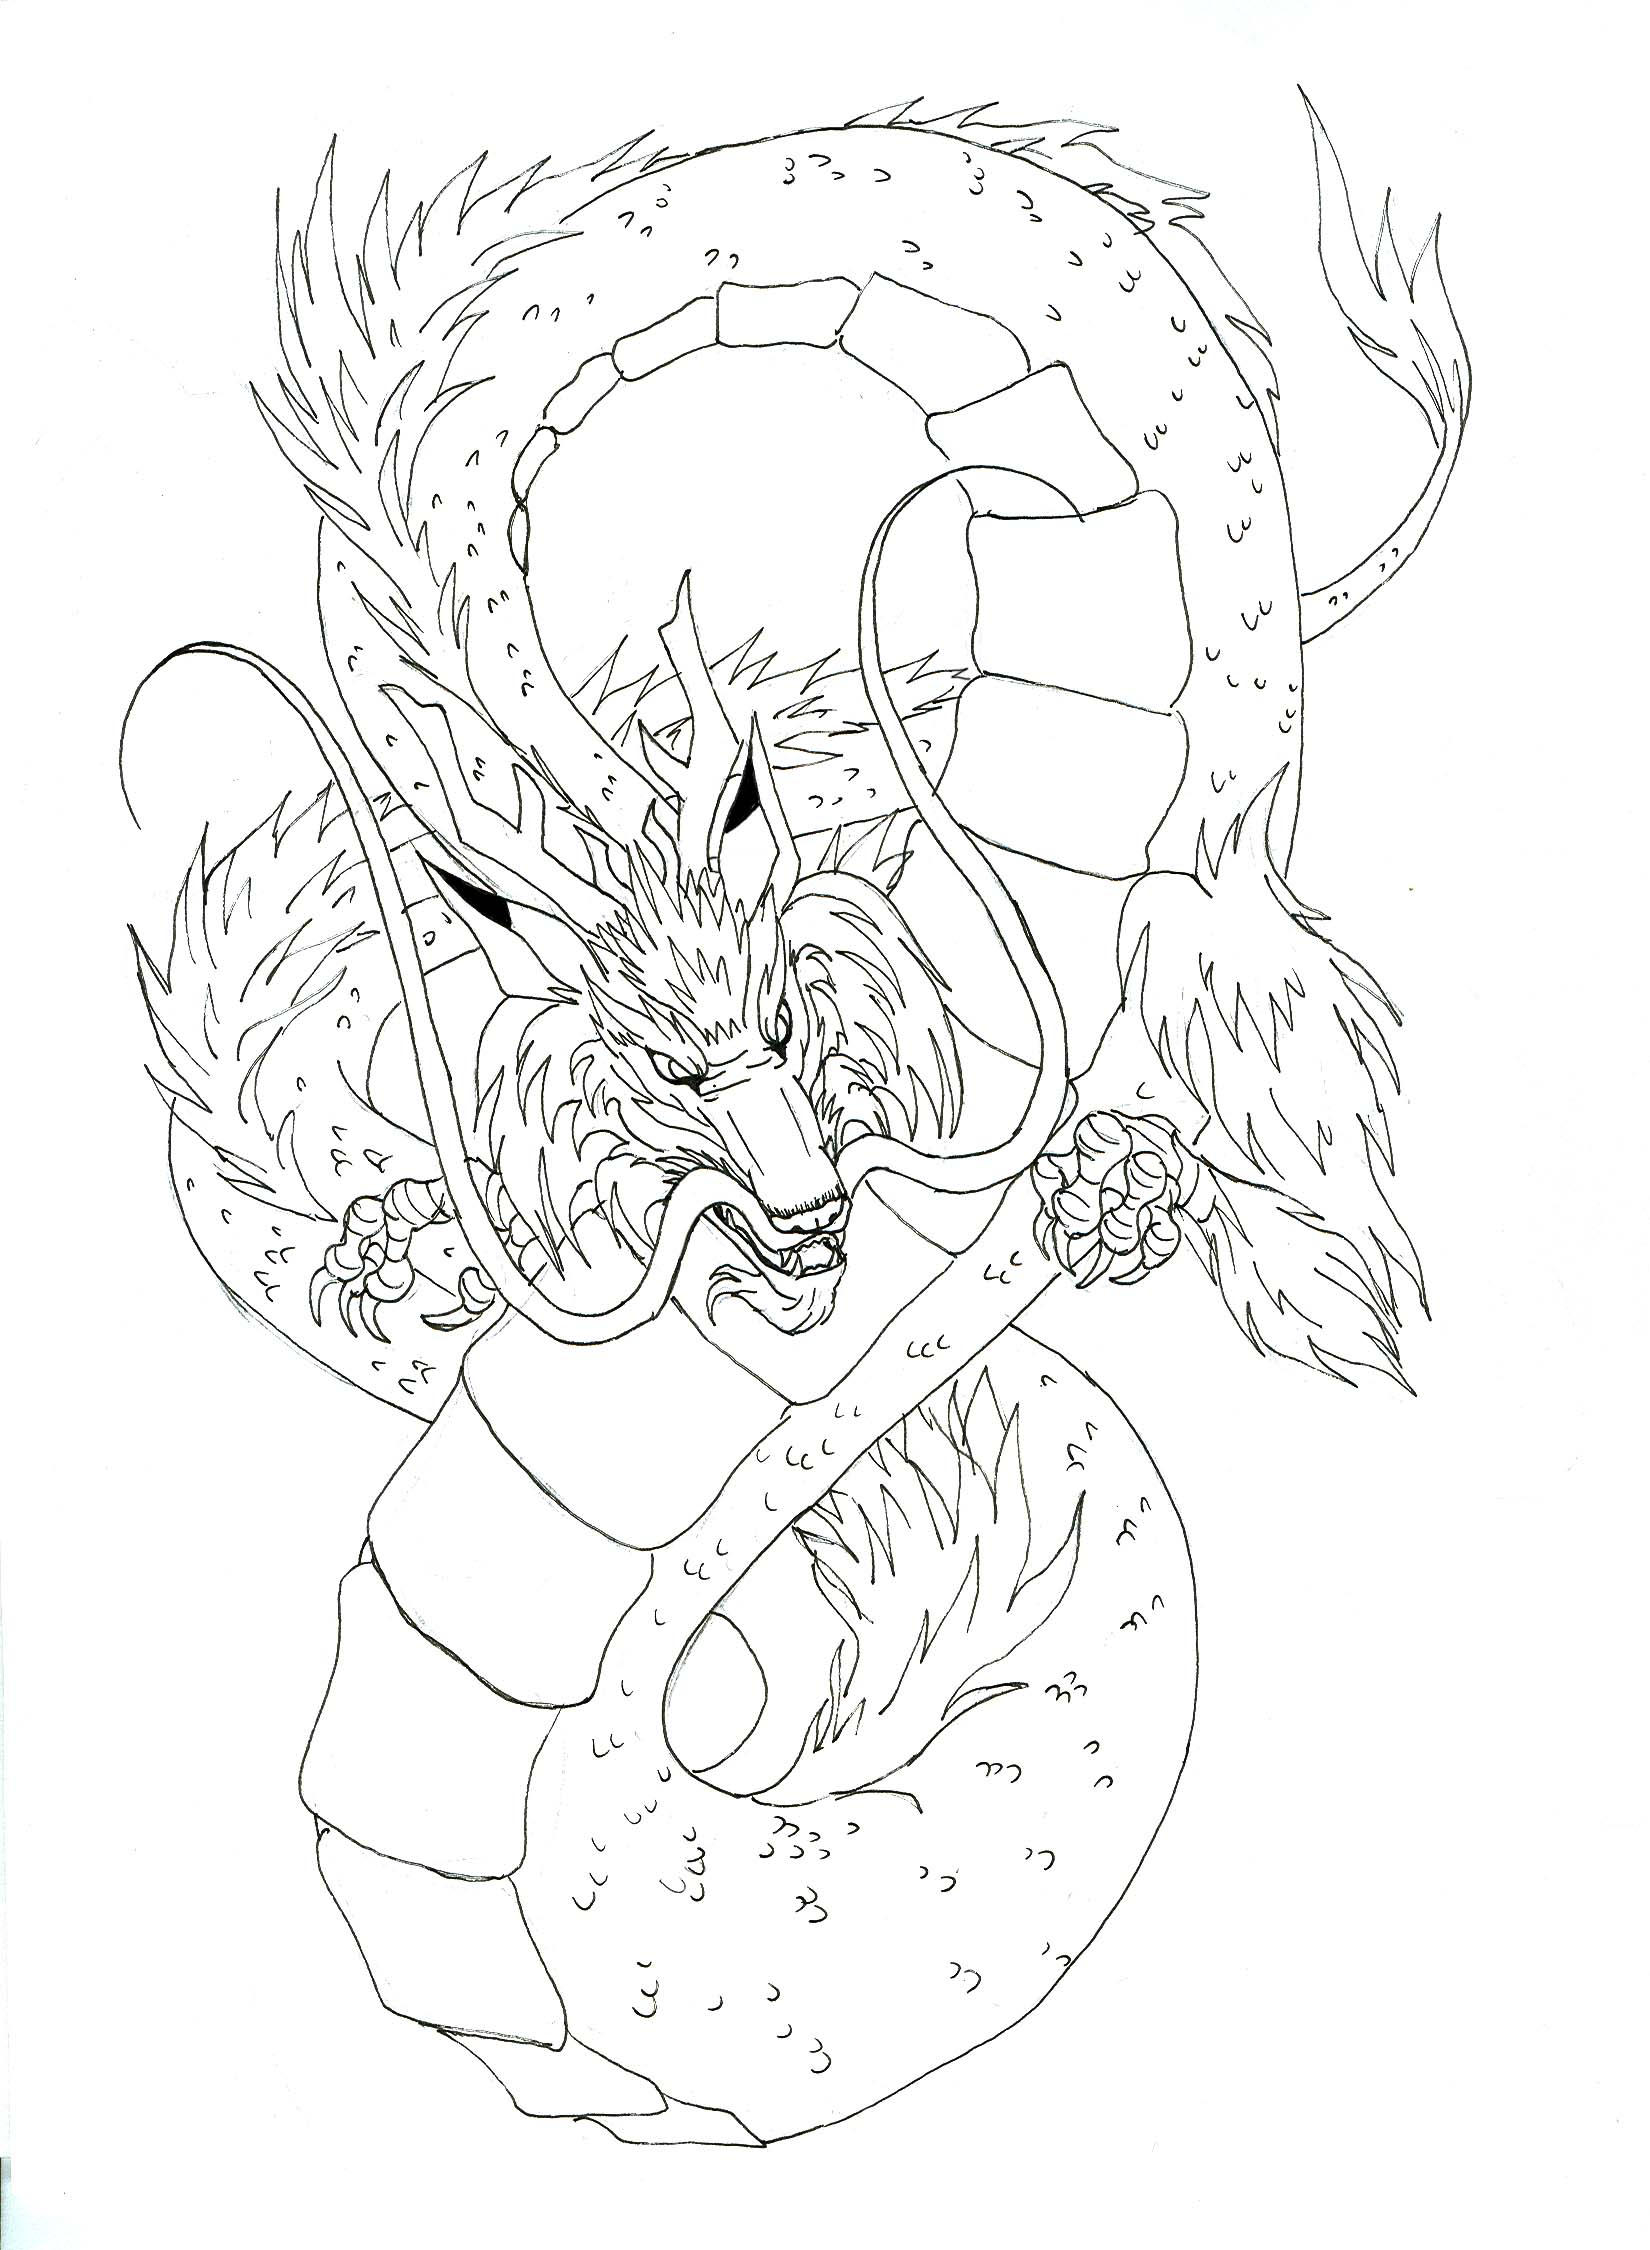 Dragon Wrath By Lizzy23 Dragon Wrath By Lizzy23